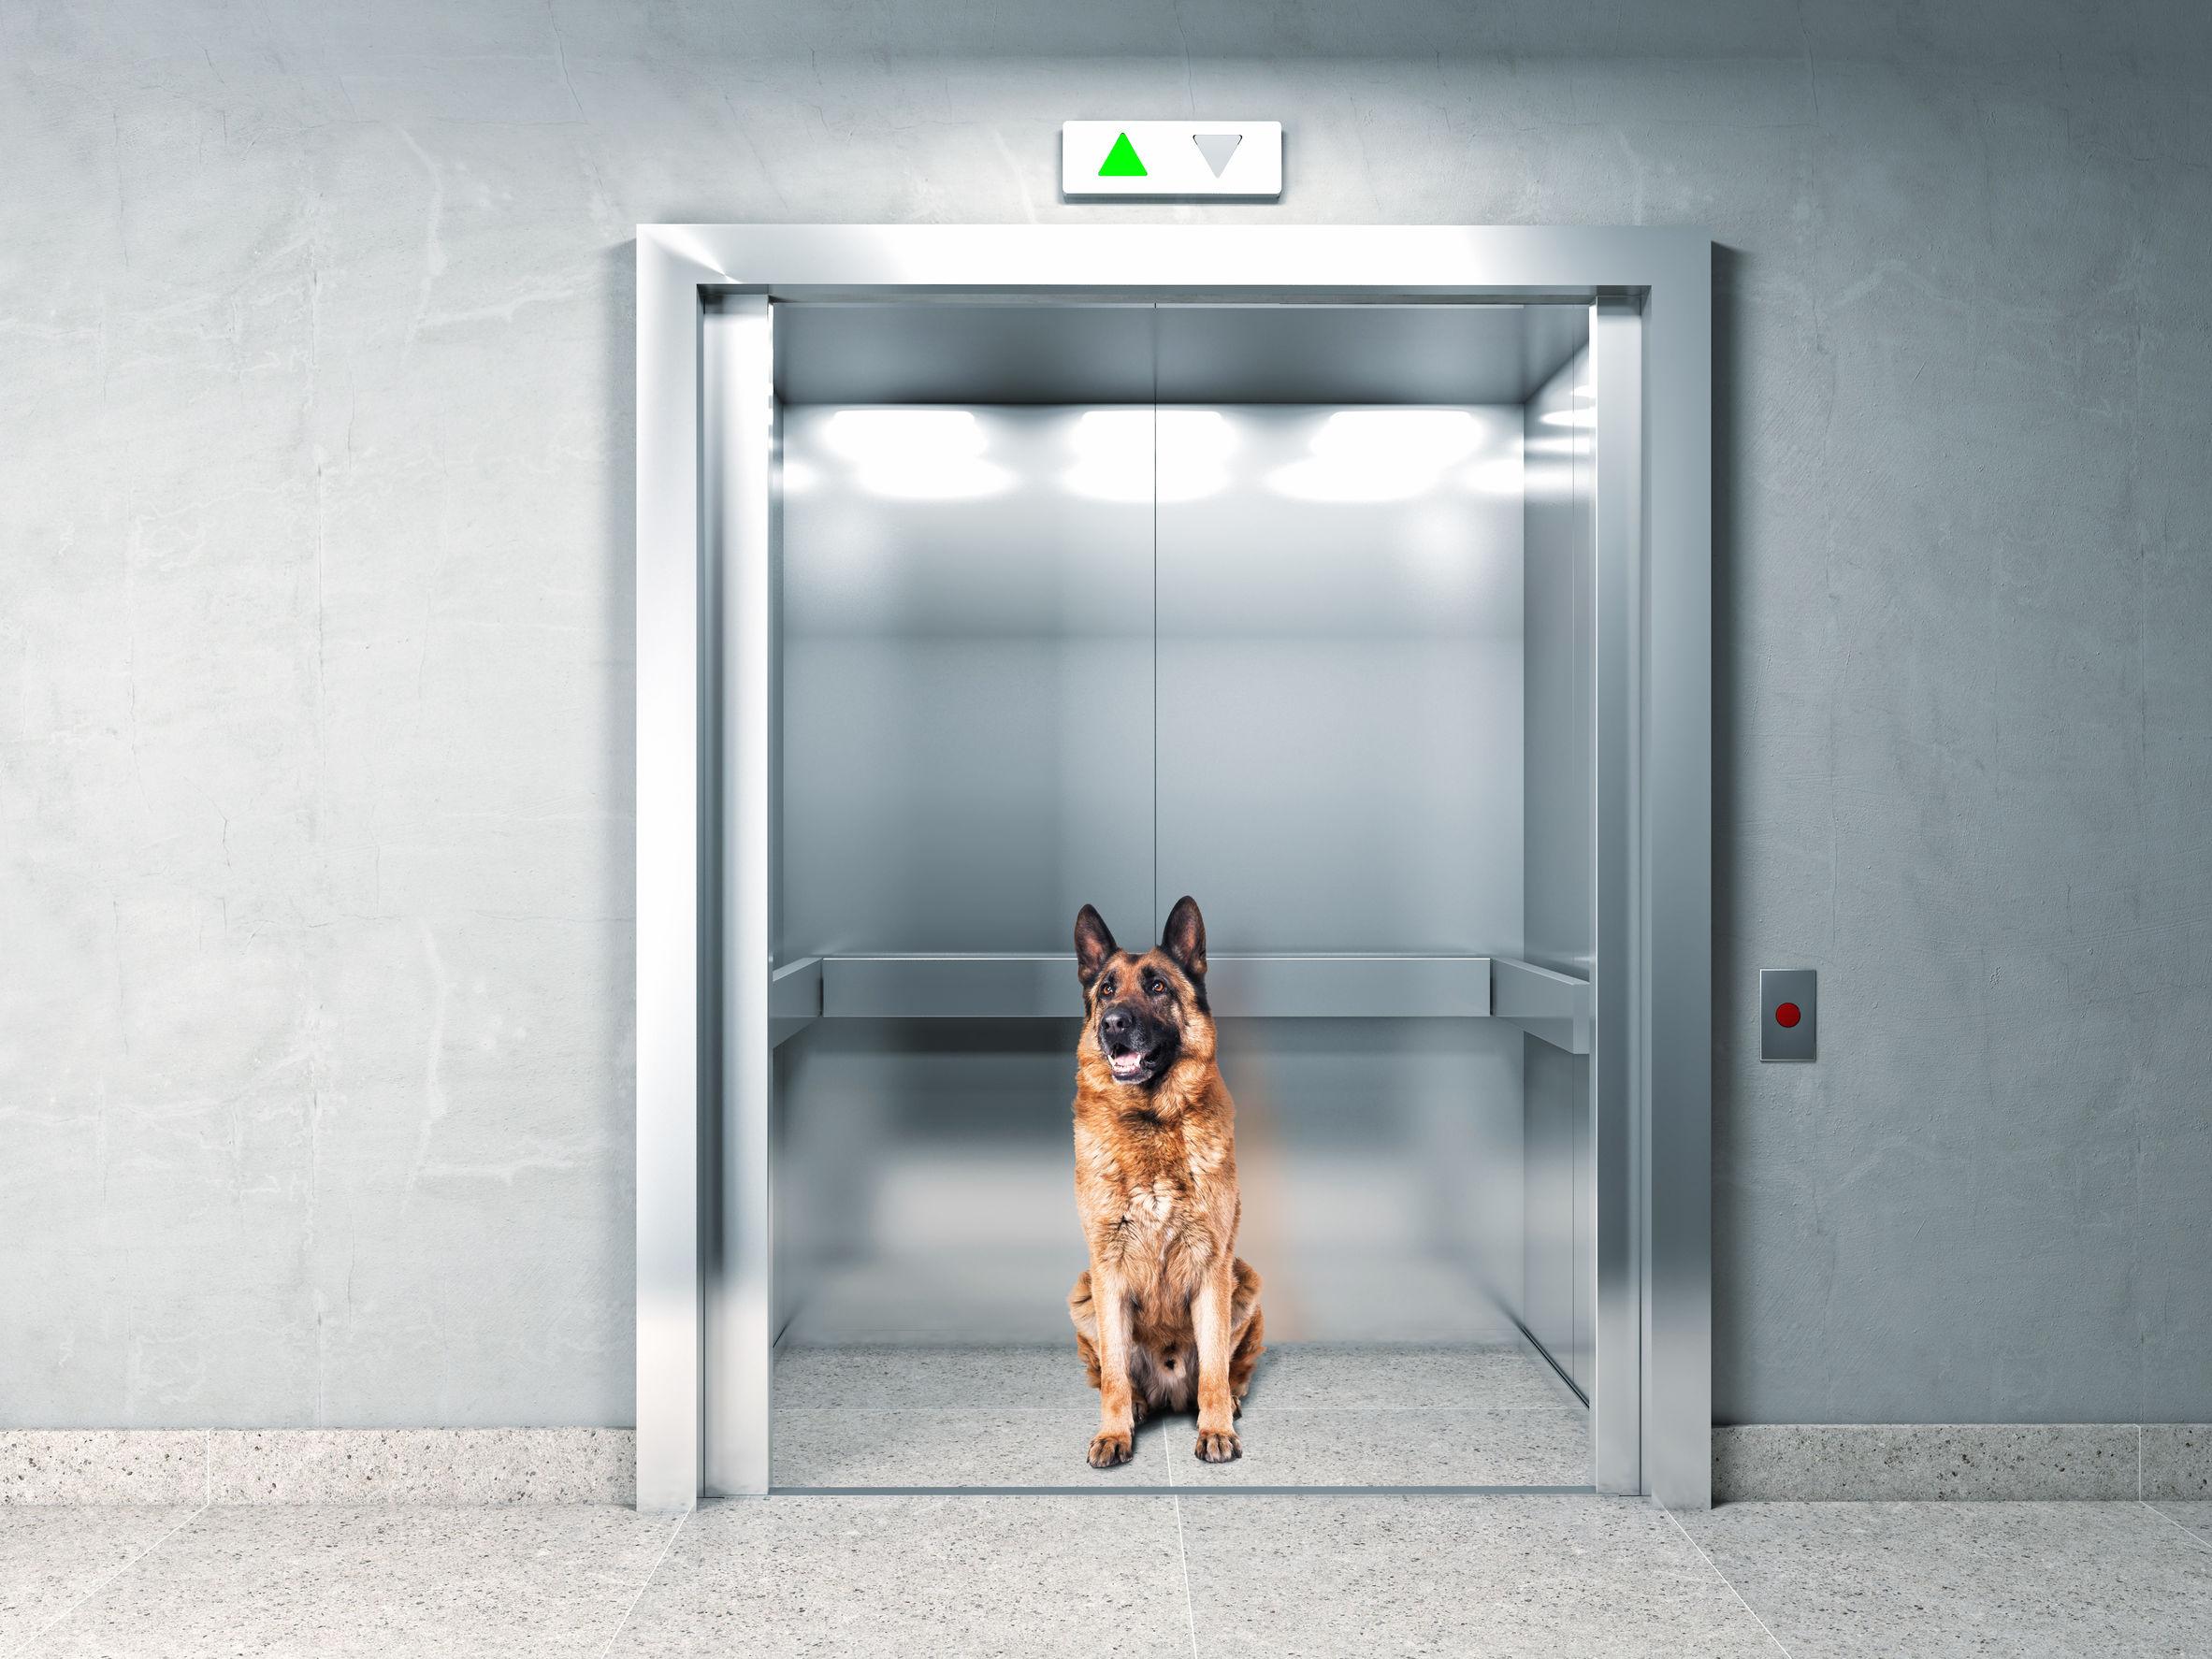 38558408 - classic elevator and german shepherd